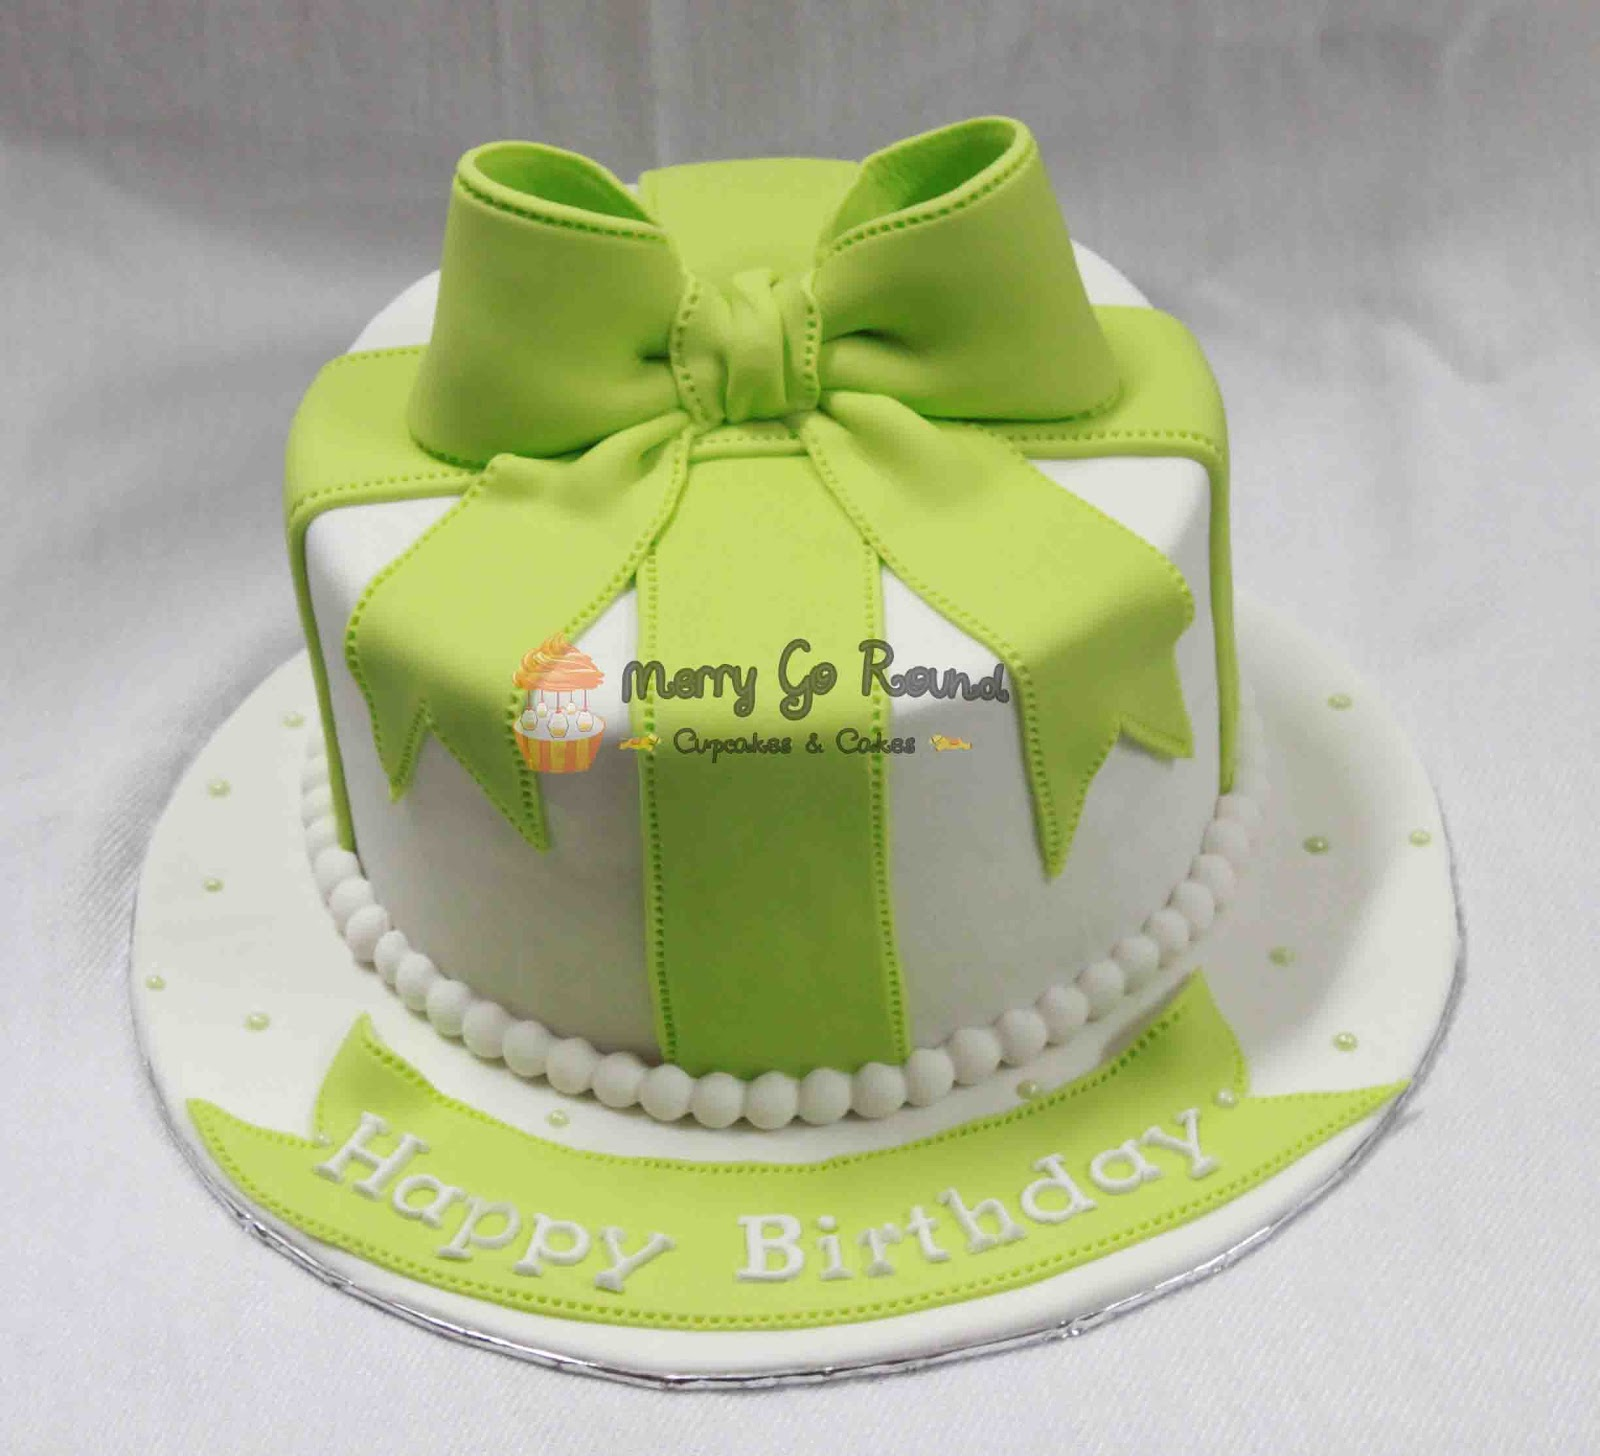 Merry go round cupcakes cakes simple gift box bday cake simple gift box bday cake negle Image collections